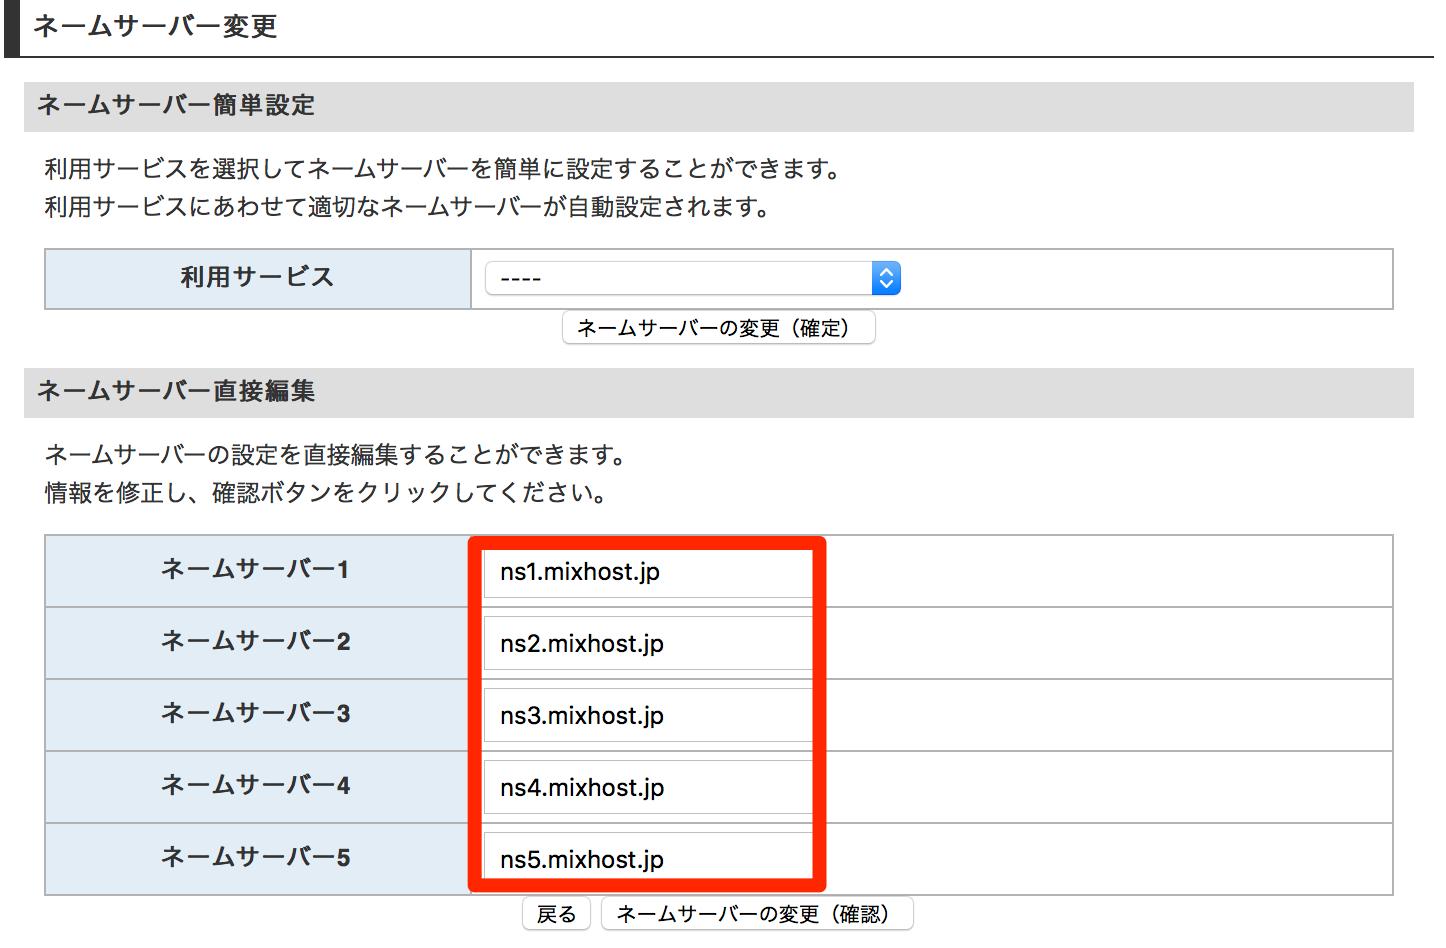 Xdomain ネームサーバー設定